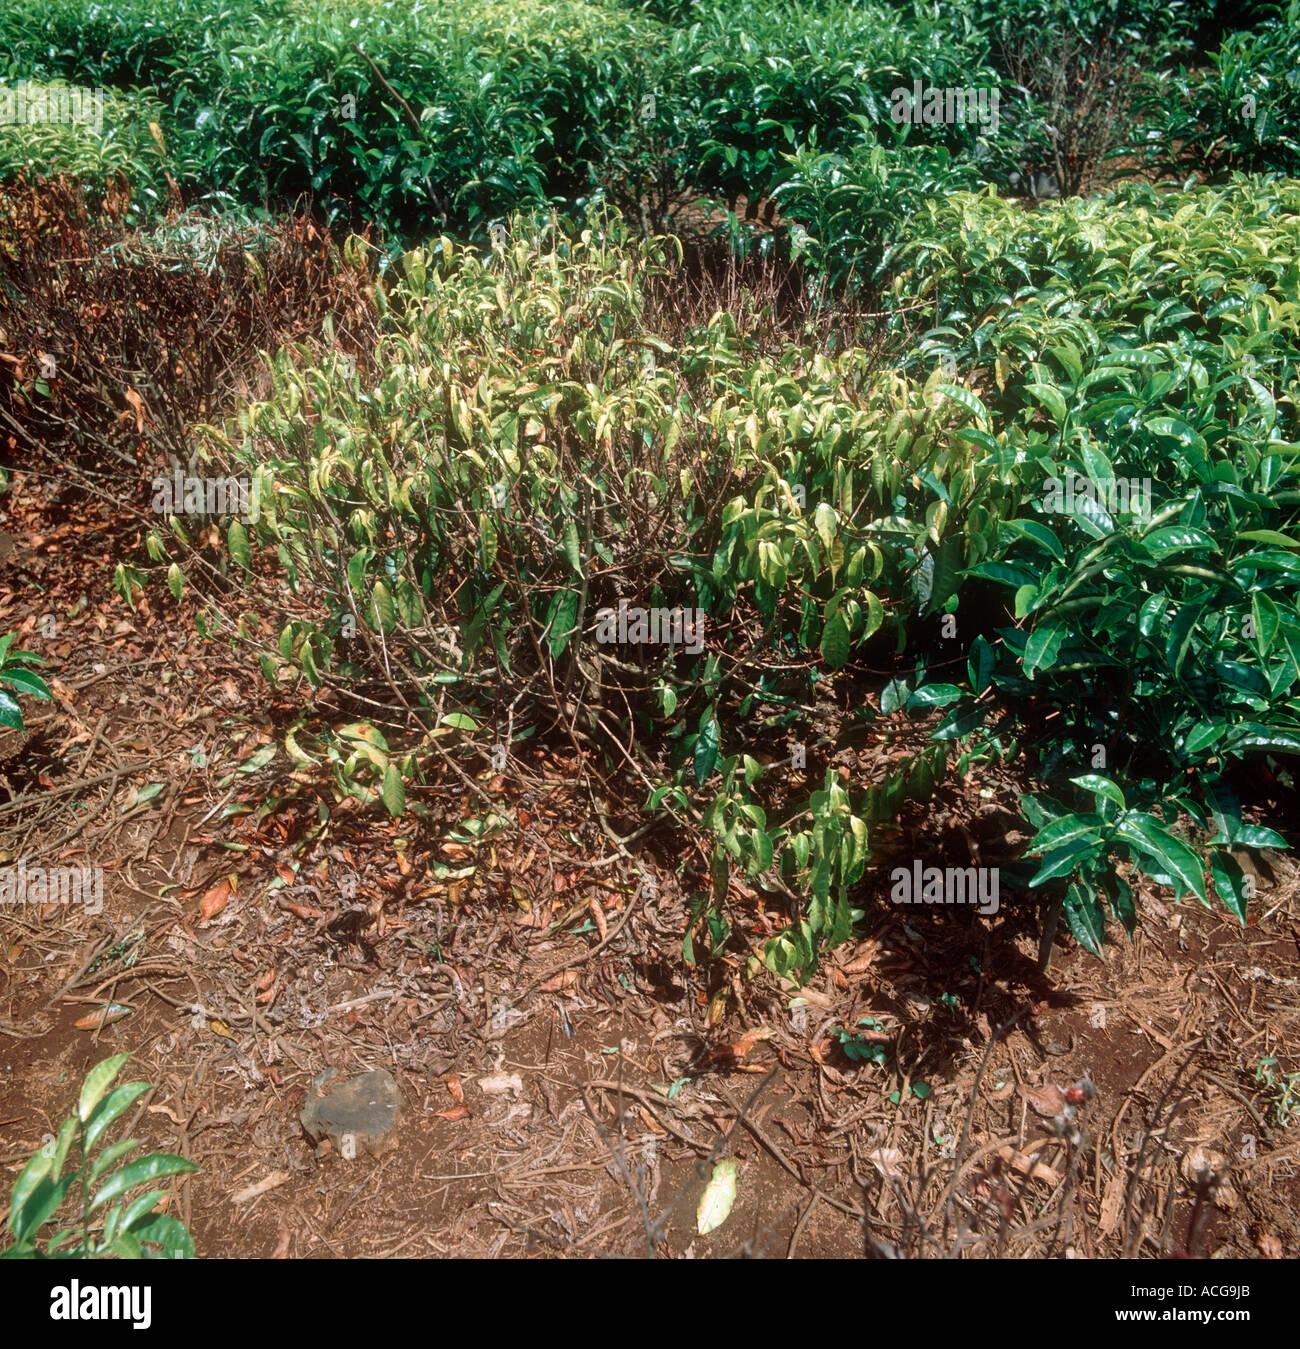 Honey fungus Armillaria mellea affecting and killing tea plant - Stock Image